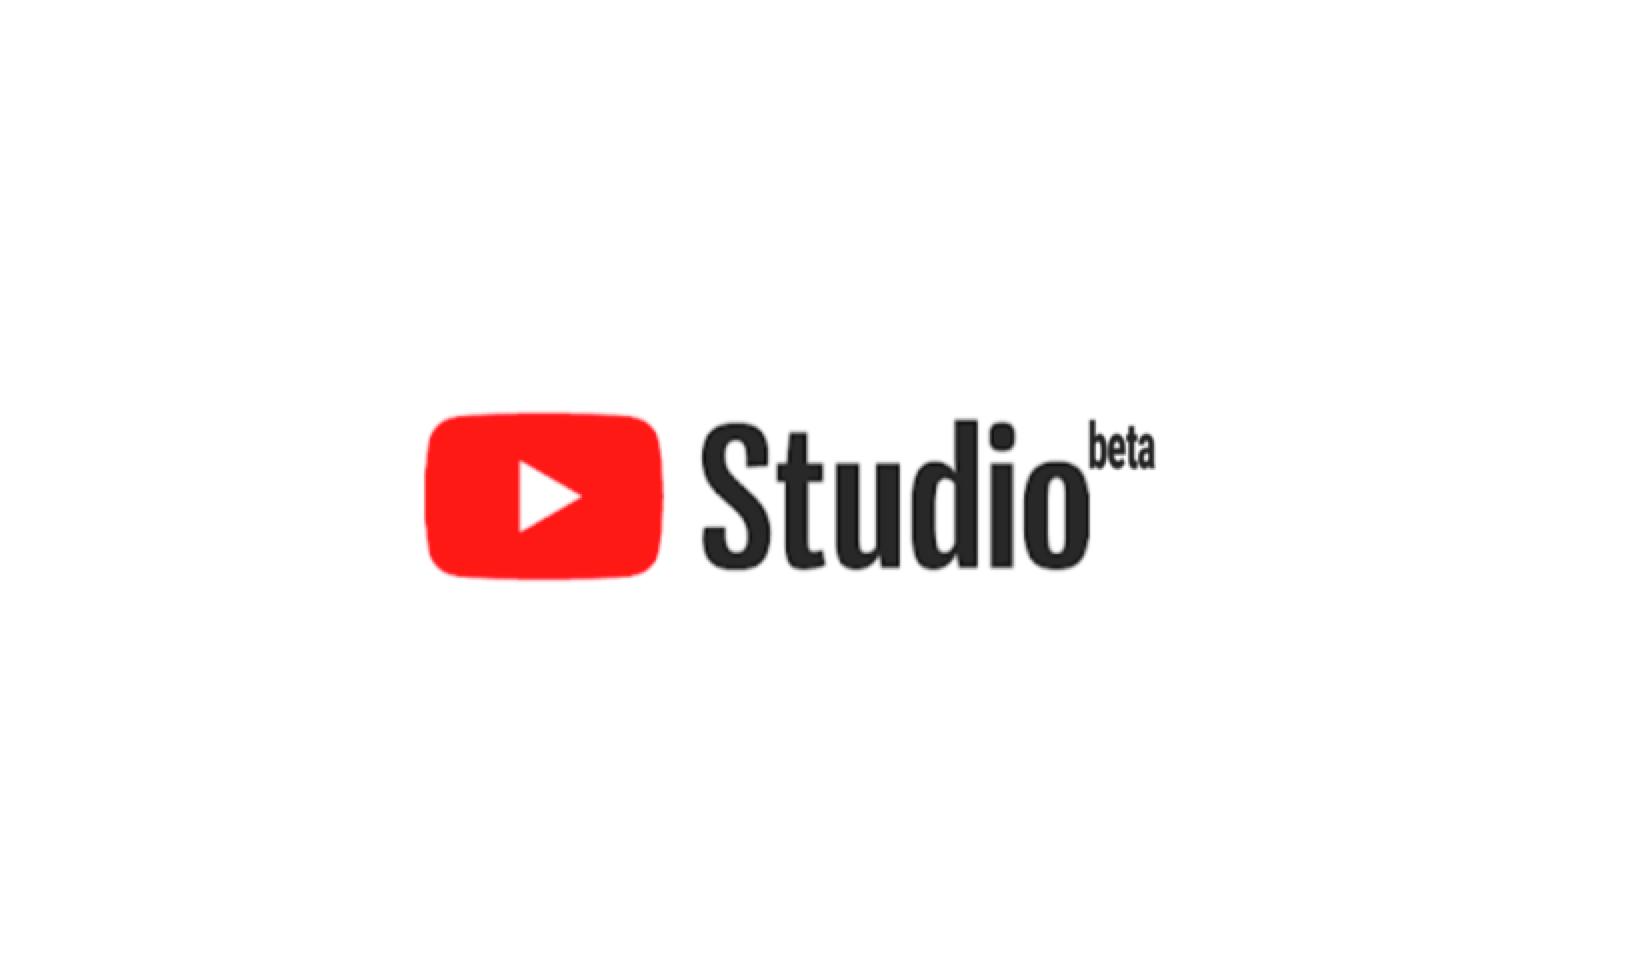 YouTube Studio Beta: What We Like and What We Would Improve.